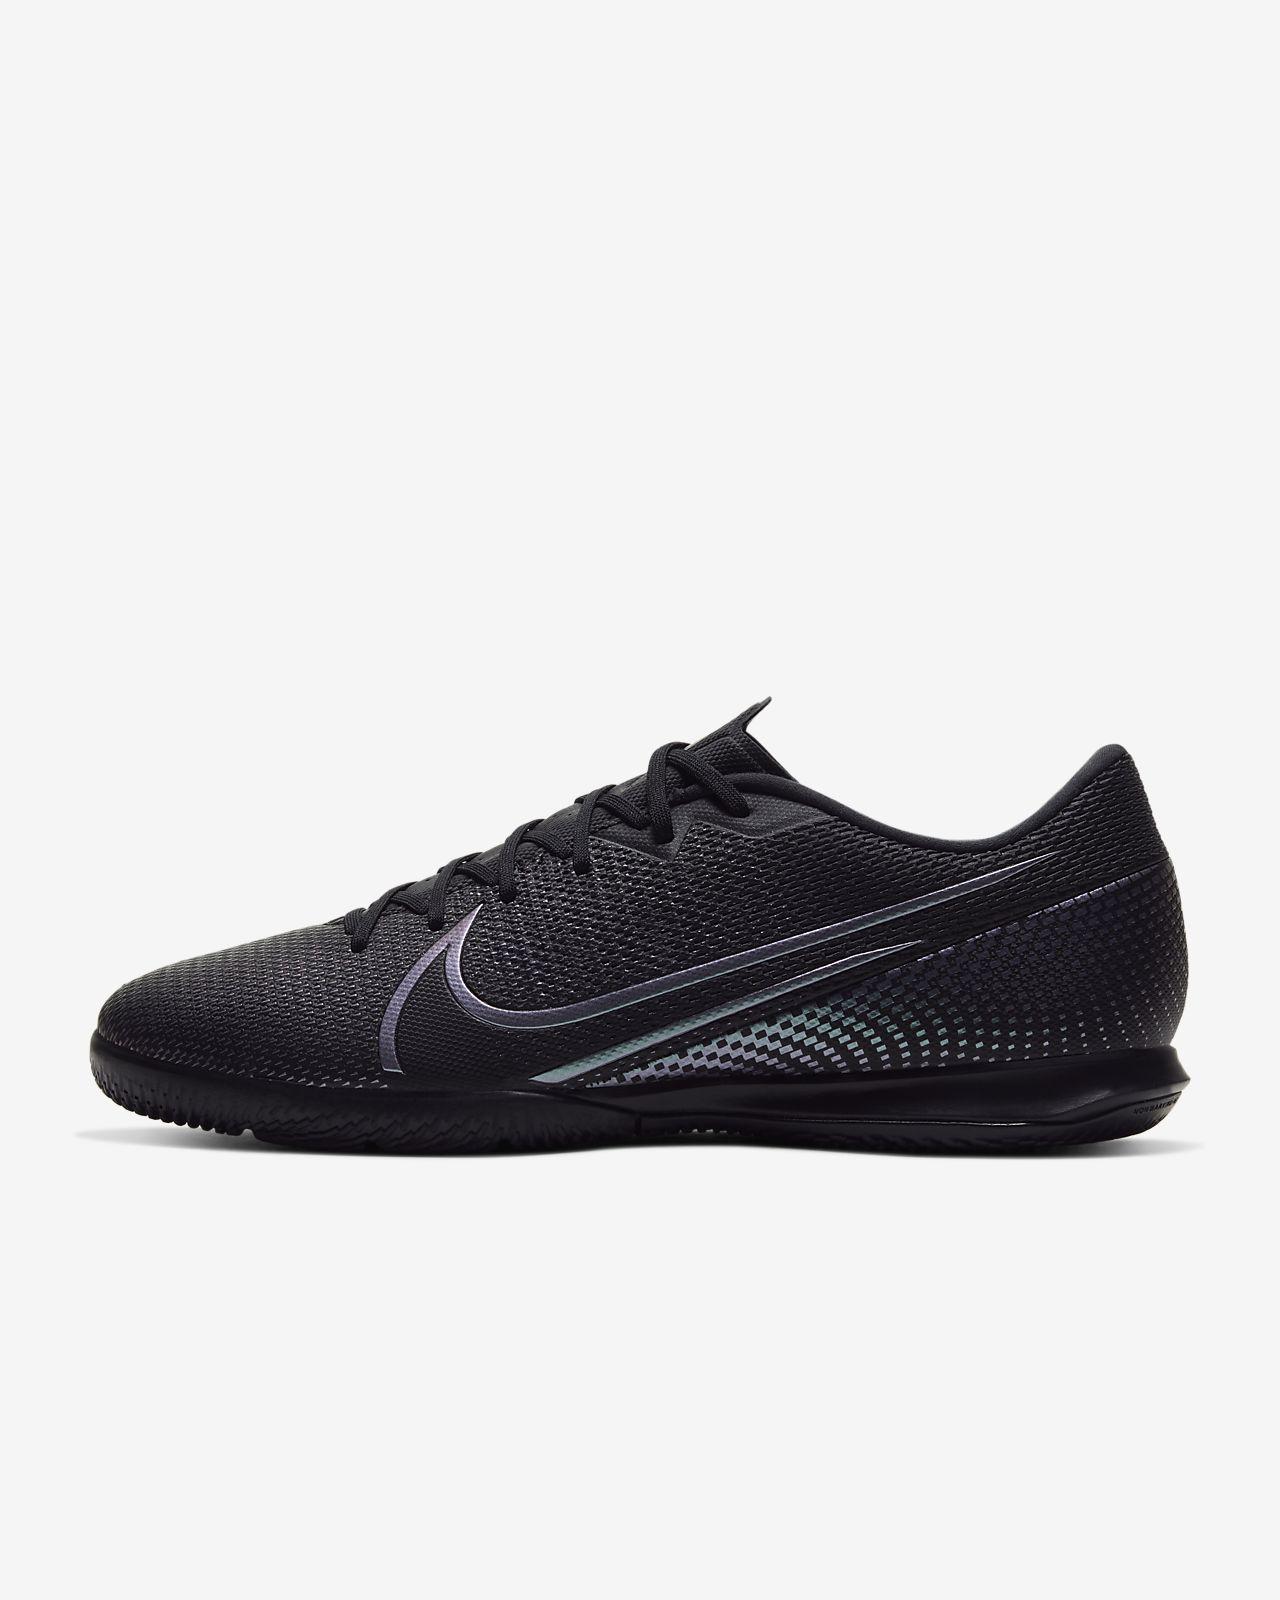 Sapatilhas de futsal Nike Mercurial Vapor 13 Academy IC